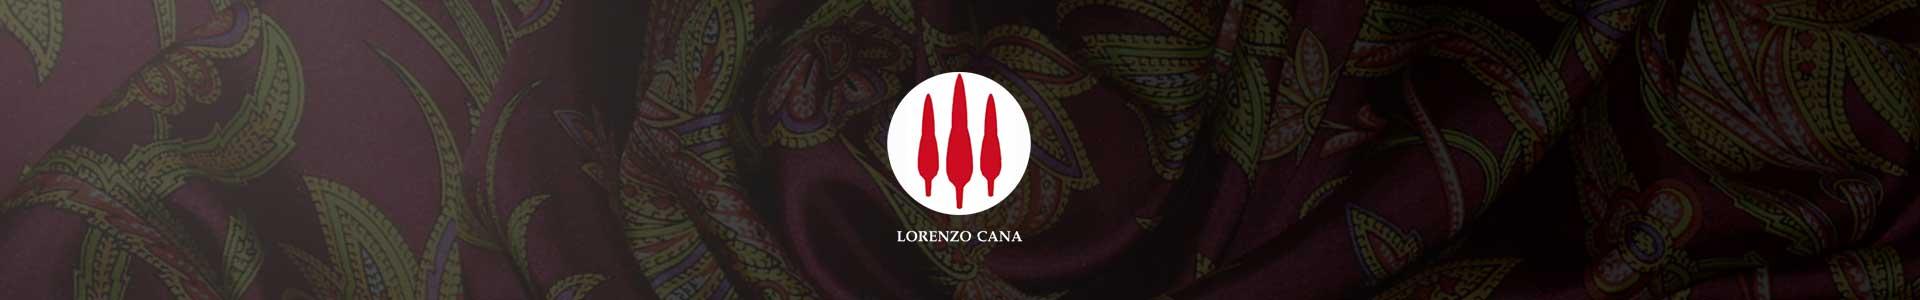 LORENZO CANA Logo and Silk Scarf